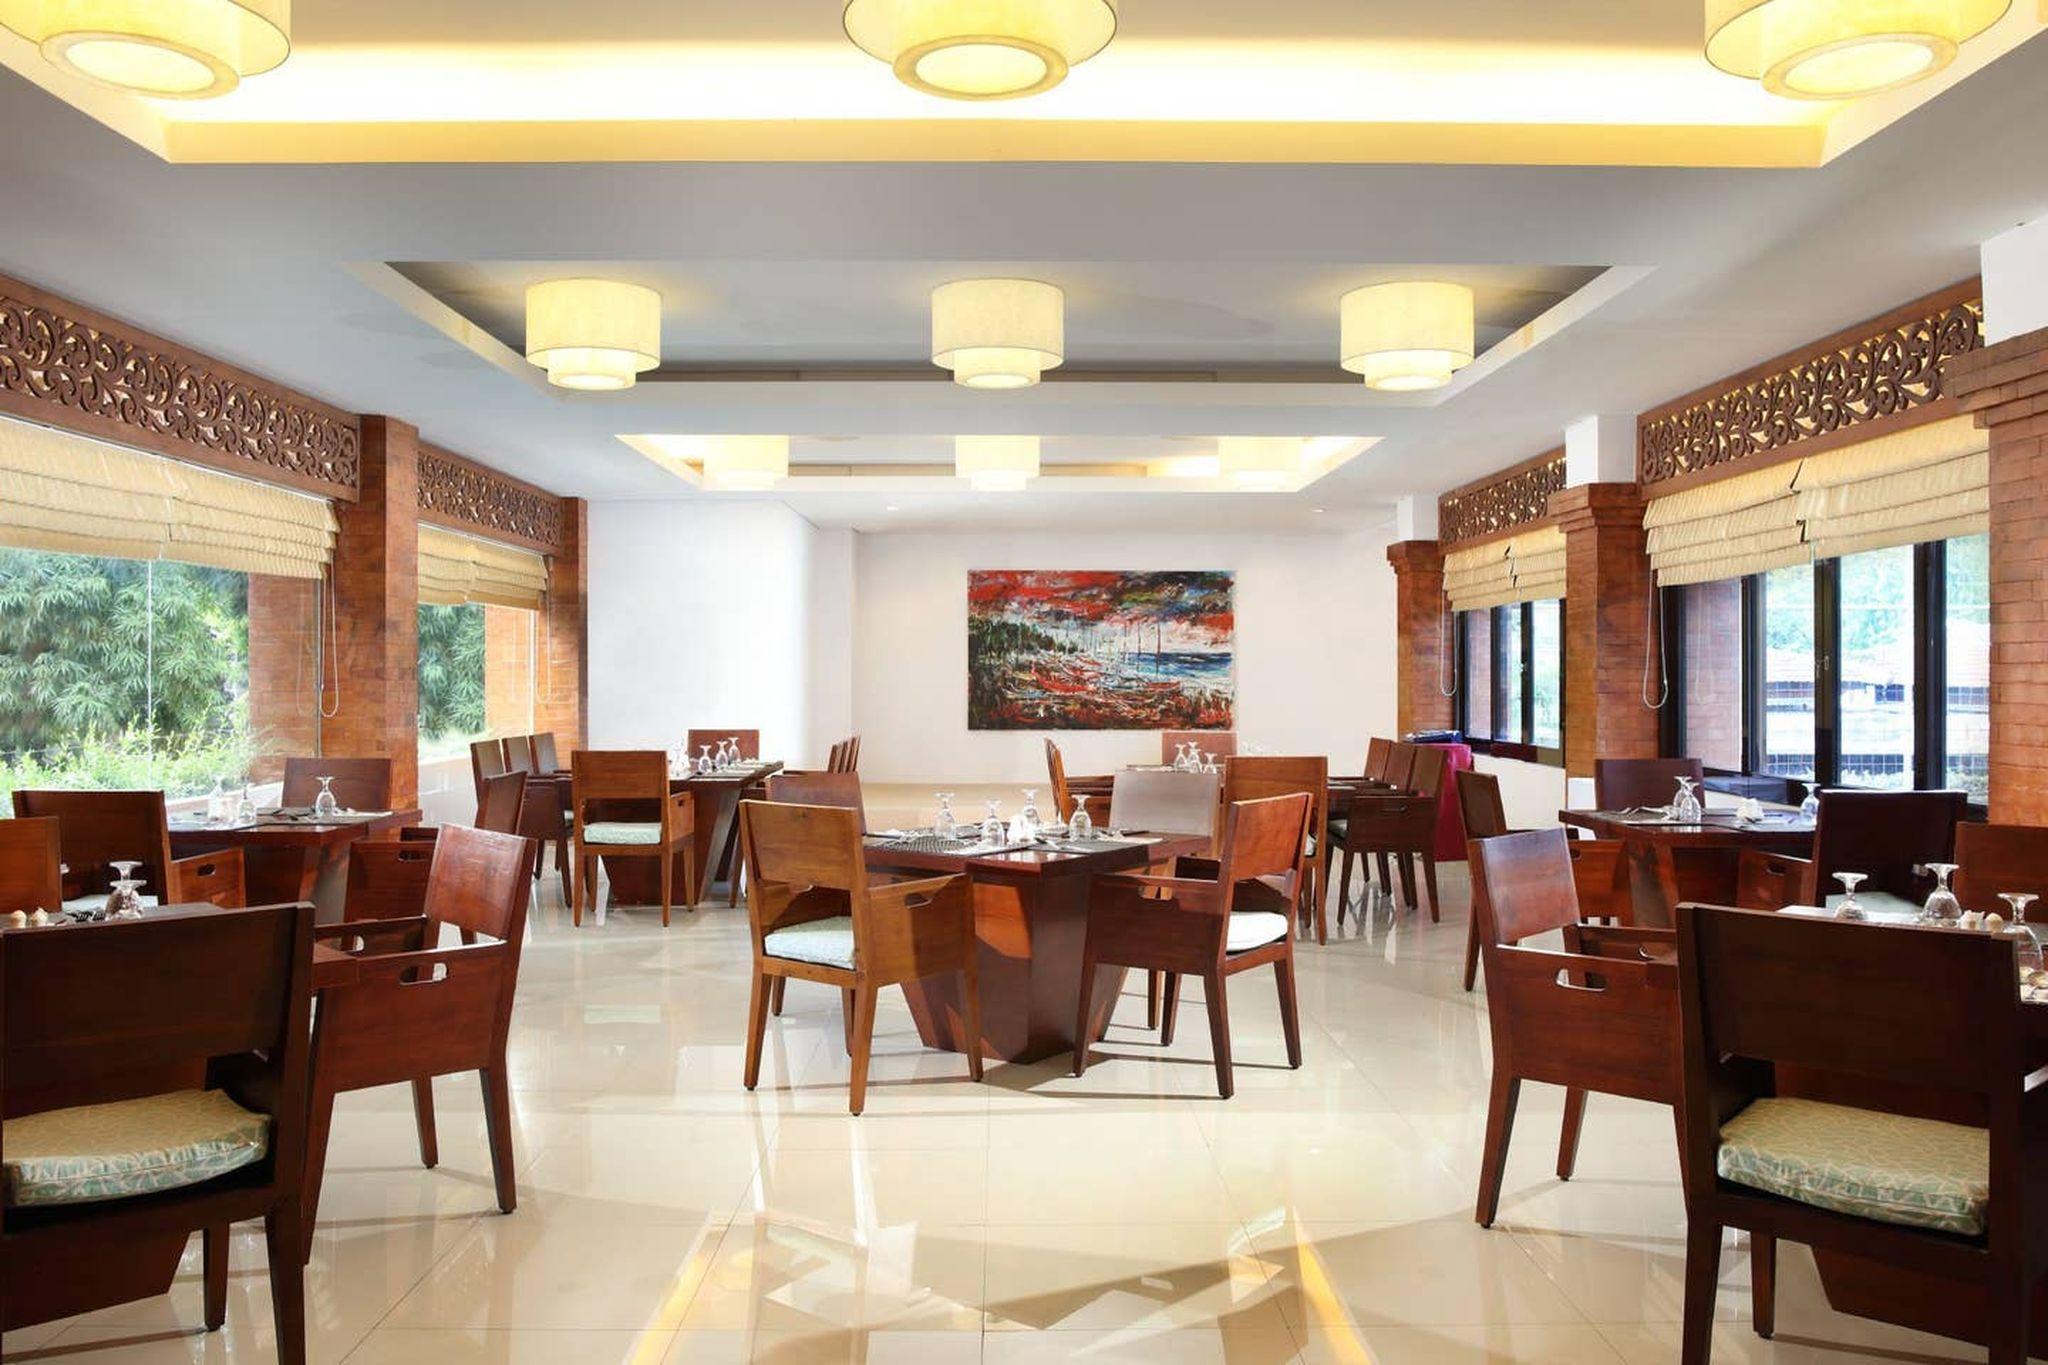 Budget Room In Denpasar